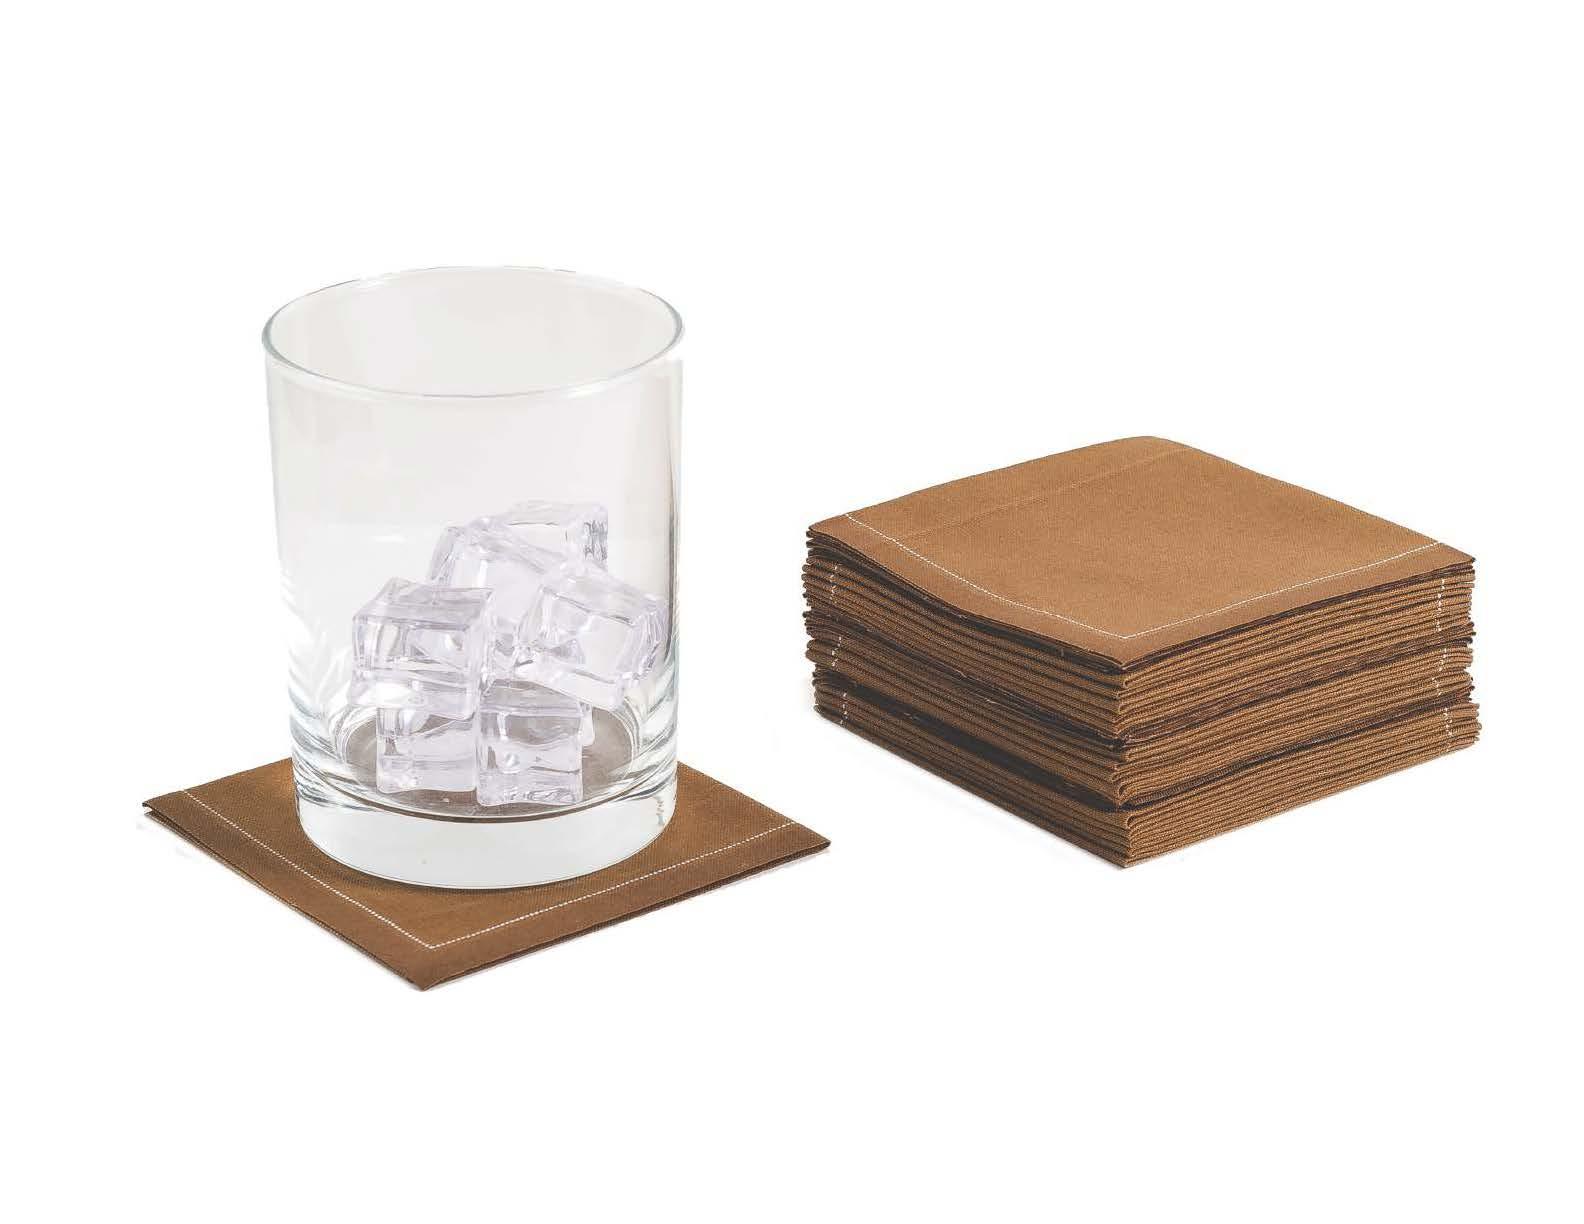 "Khaki Cotton 1/4 Fold Cocktail (140 GSM) - 8"" x 8"" (folded 4"" x 4"") - 600 units"